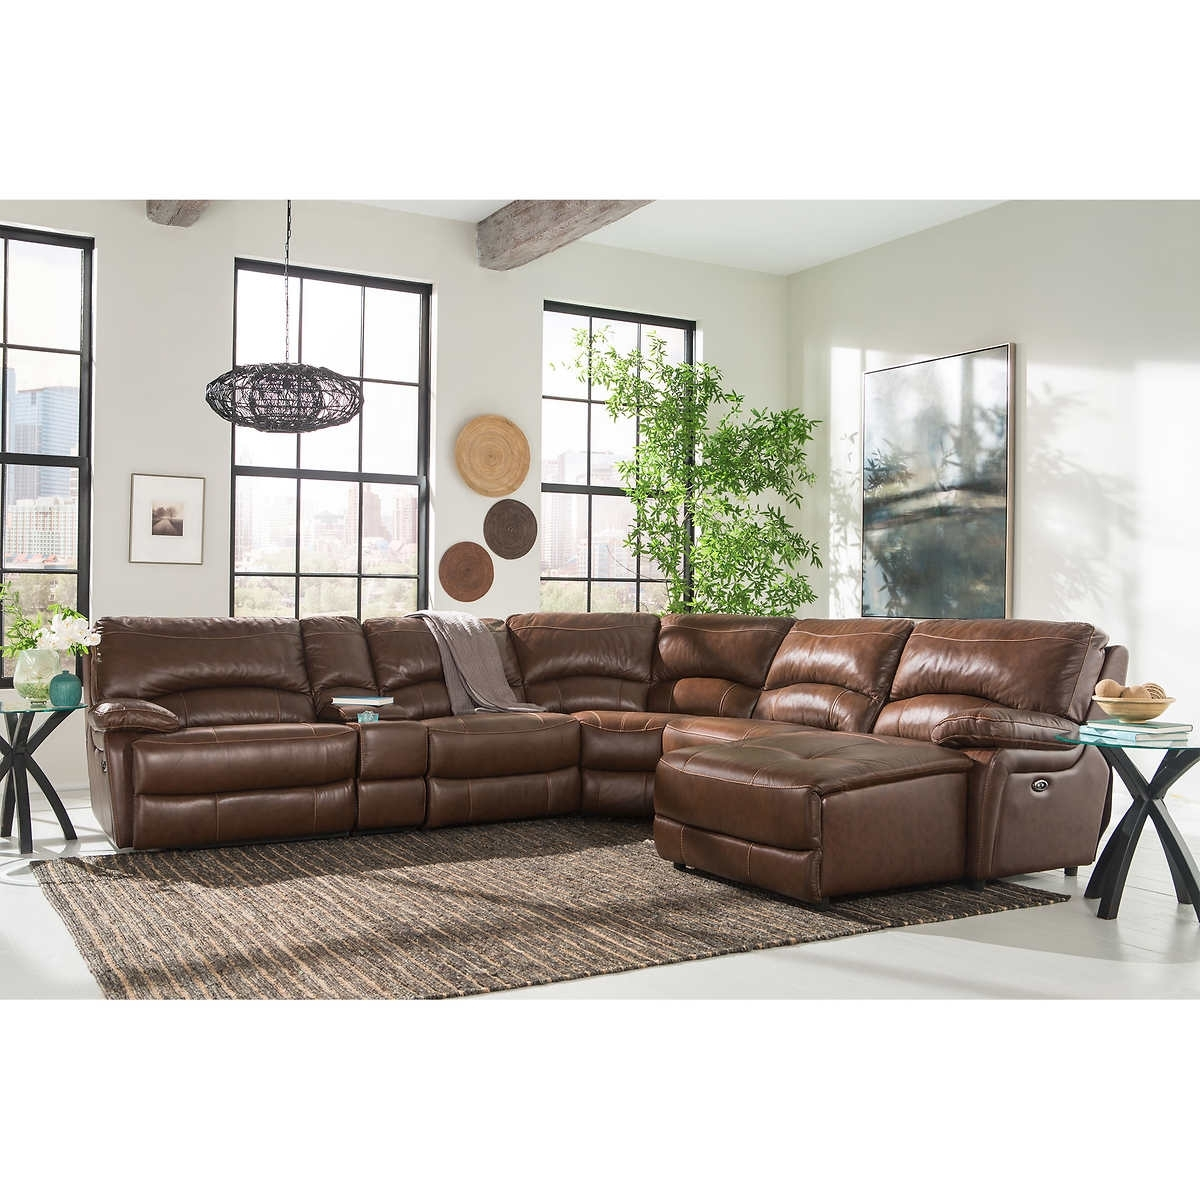 Furniture: Sofa 6 Piece Leather Sectional Sofa Cooper 6 Piece Leather with 6 Piece Leather Sectional Sofas (Image 7 of 10)